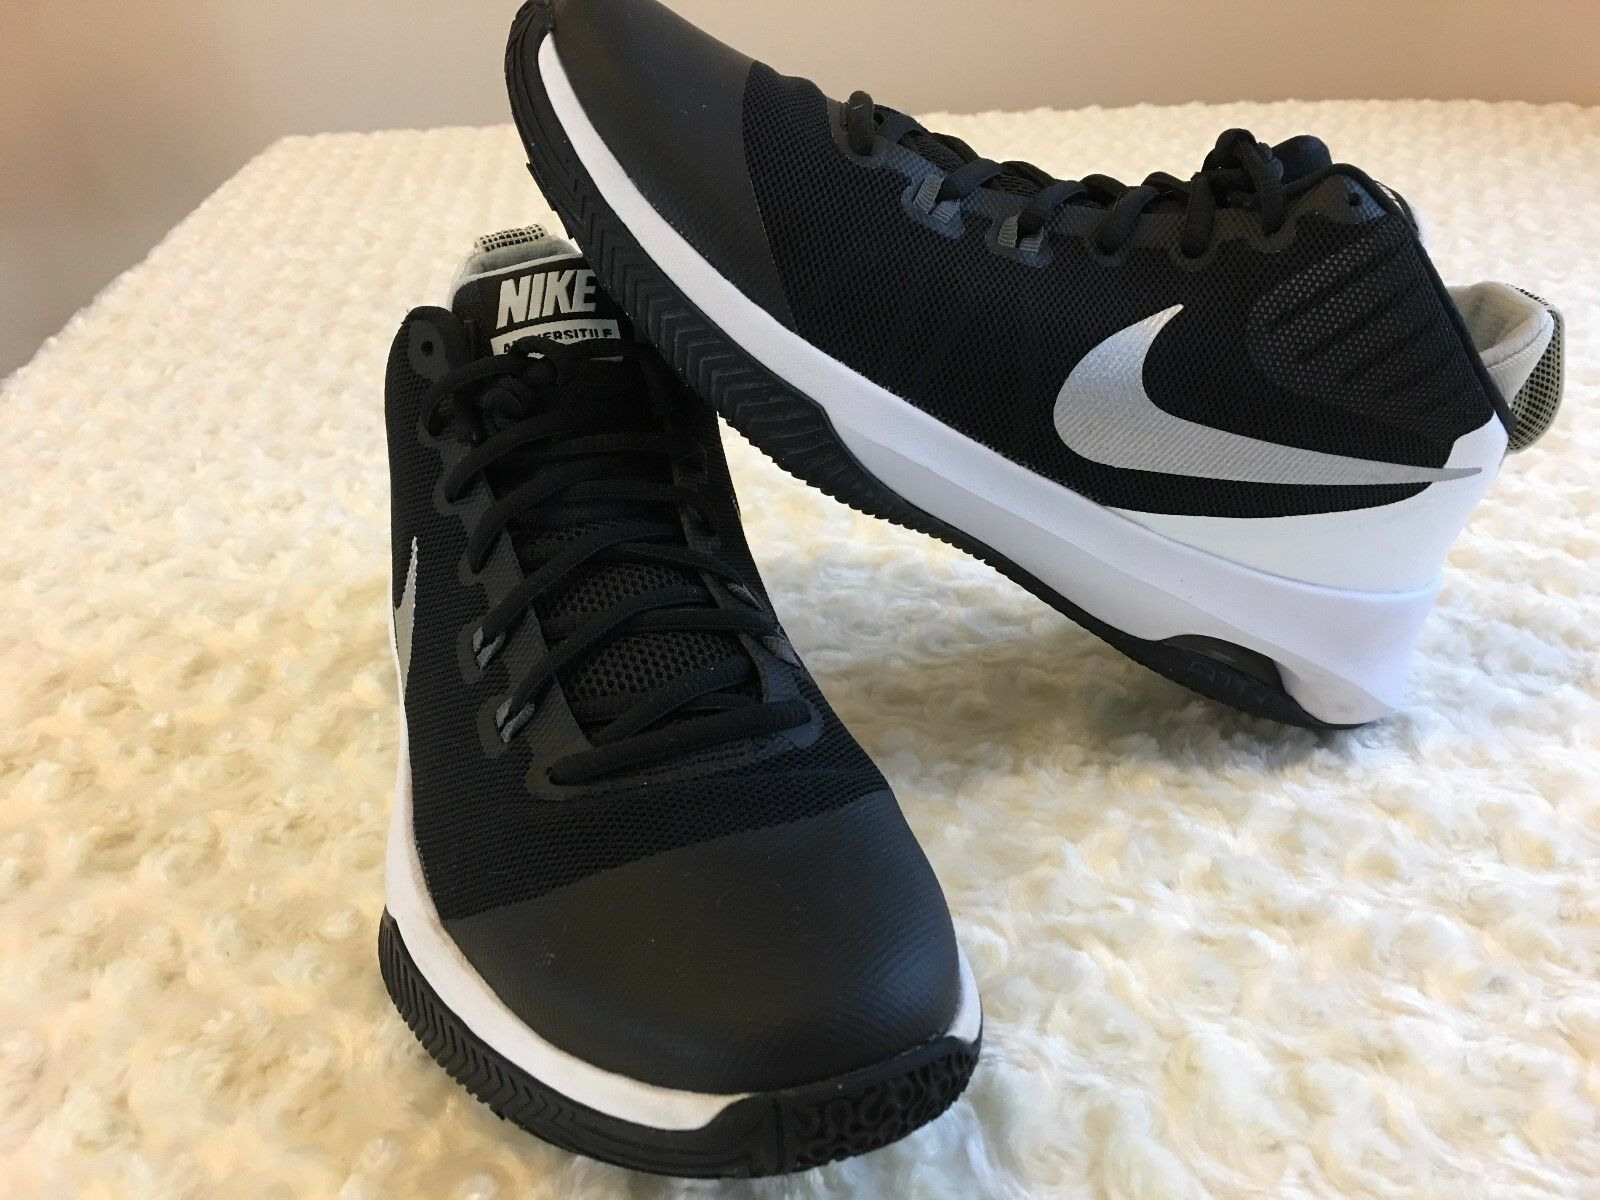 NIKE VERSATILE Women Shoes Siz 9 Black and White Basketball Sneakers Sport  Gym